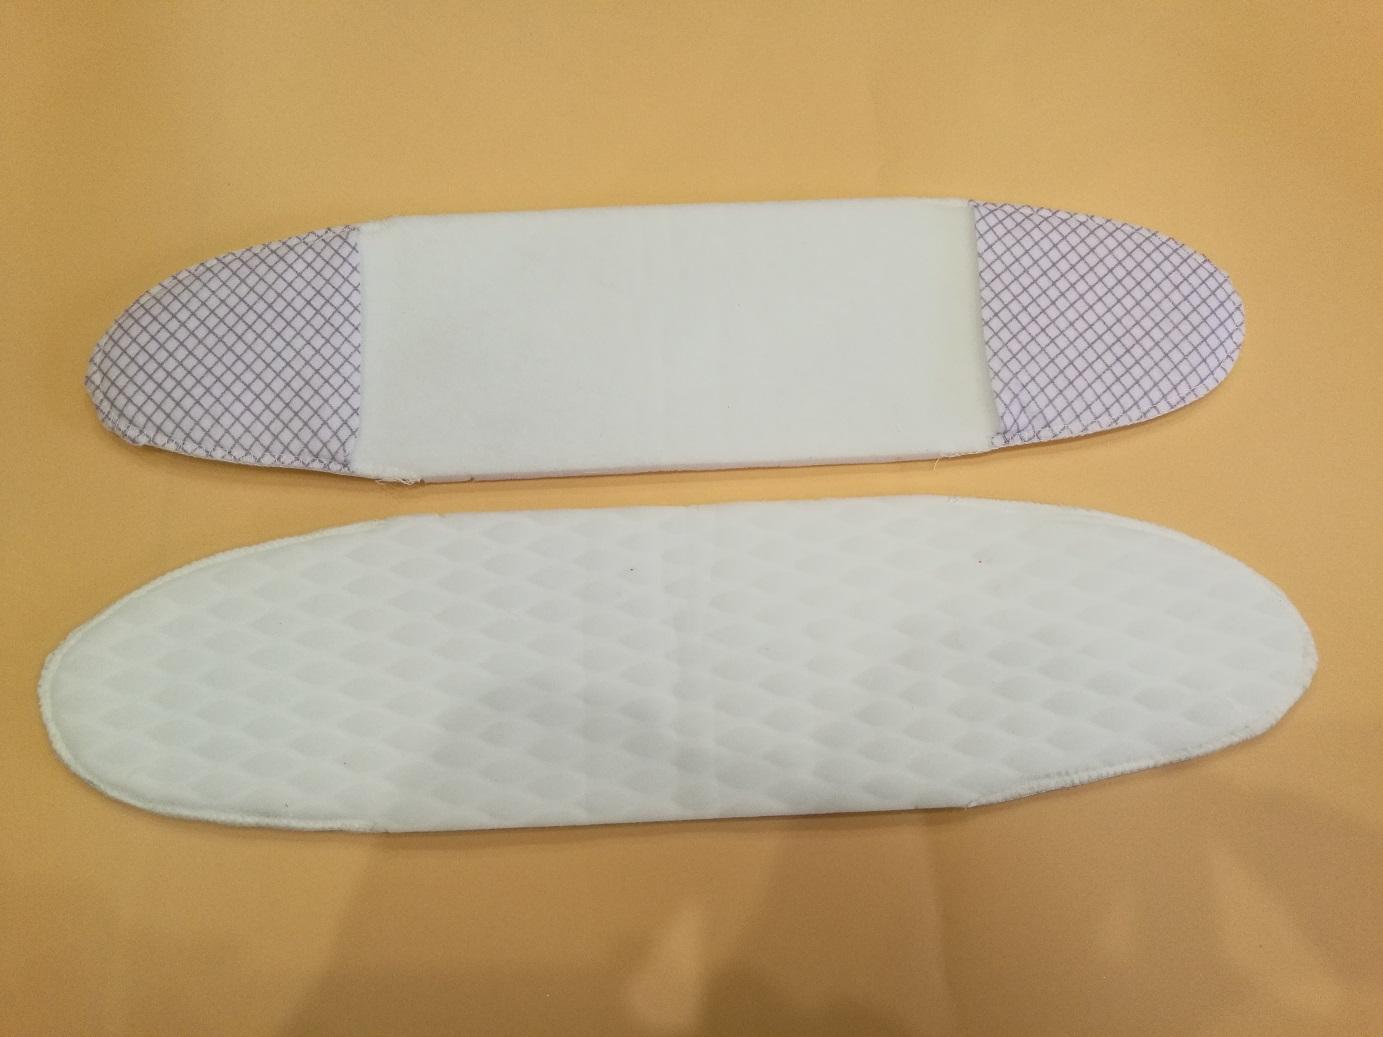 heat insulating glove 2